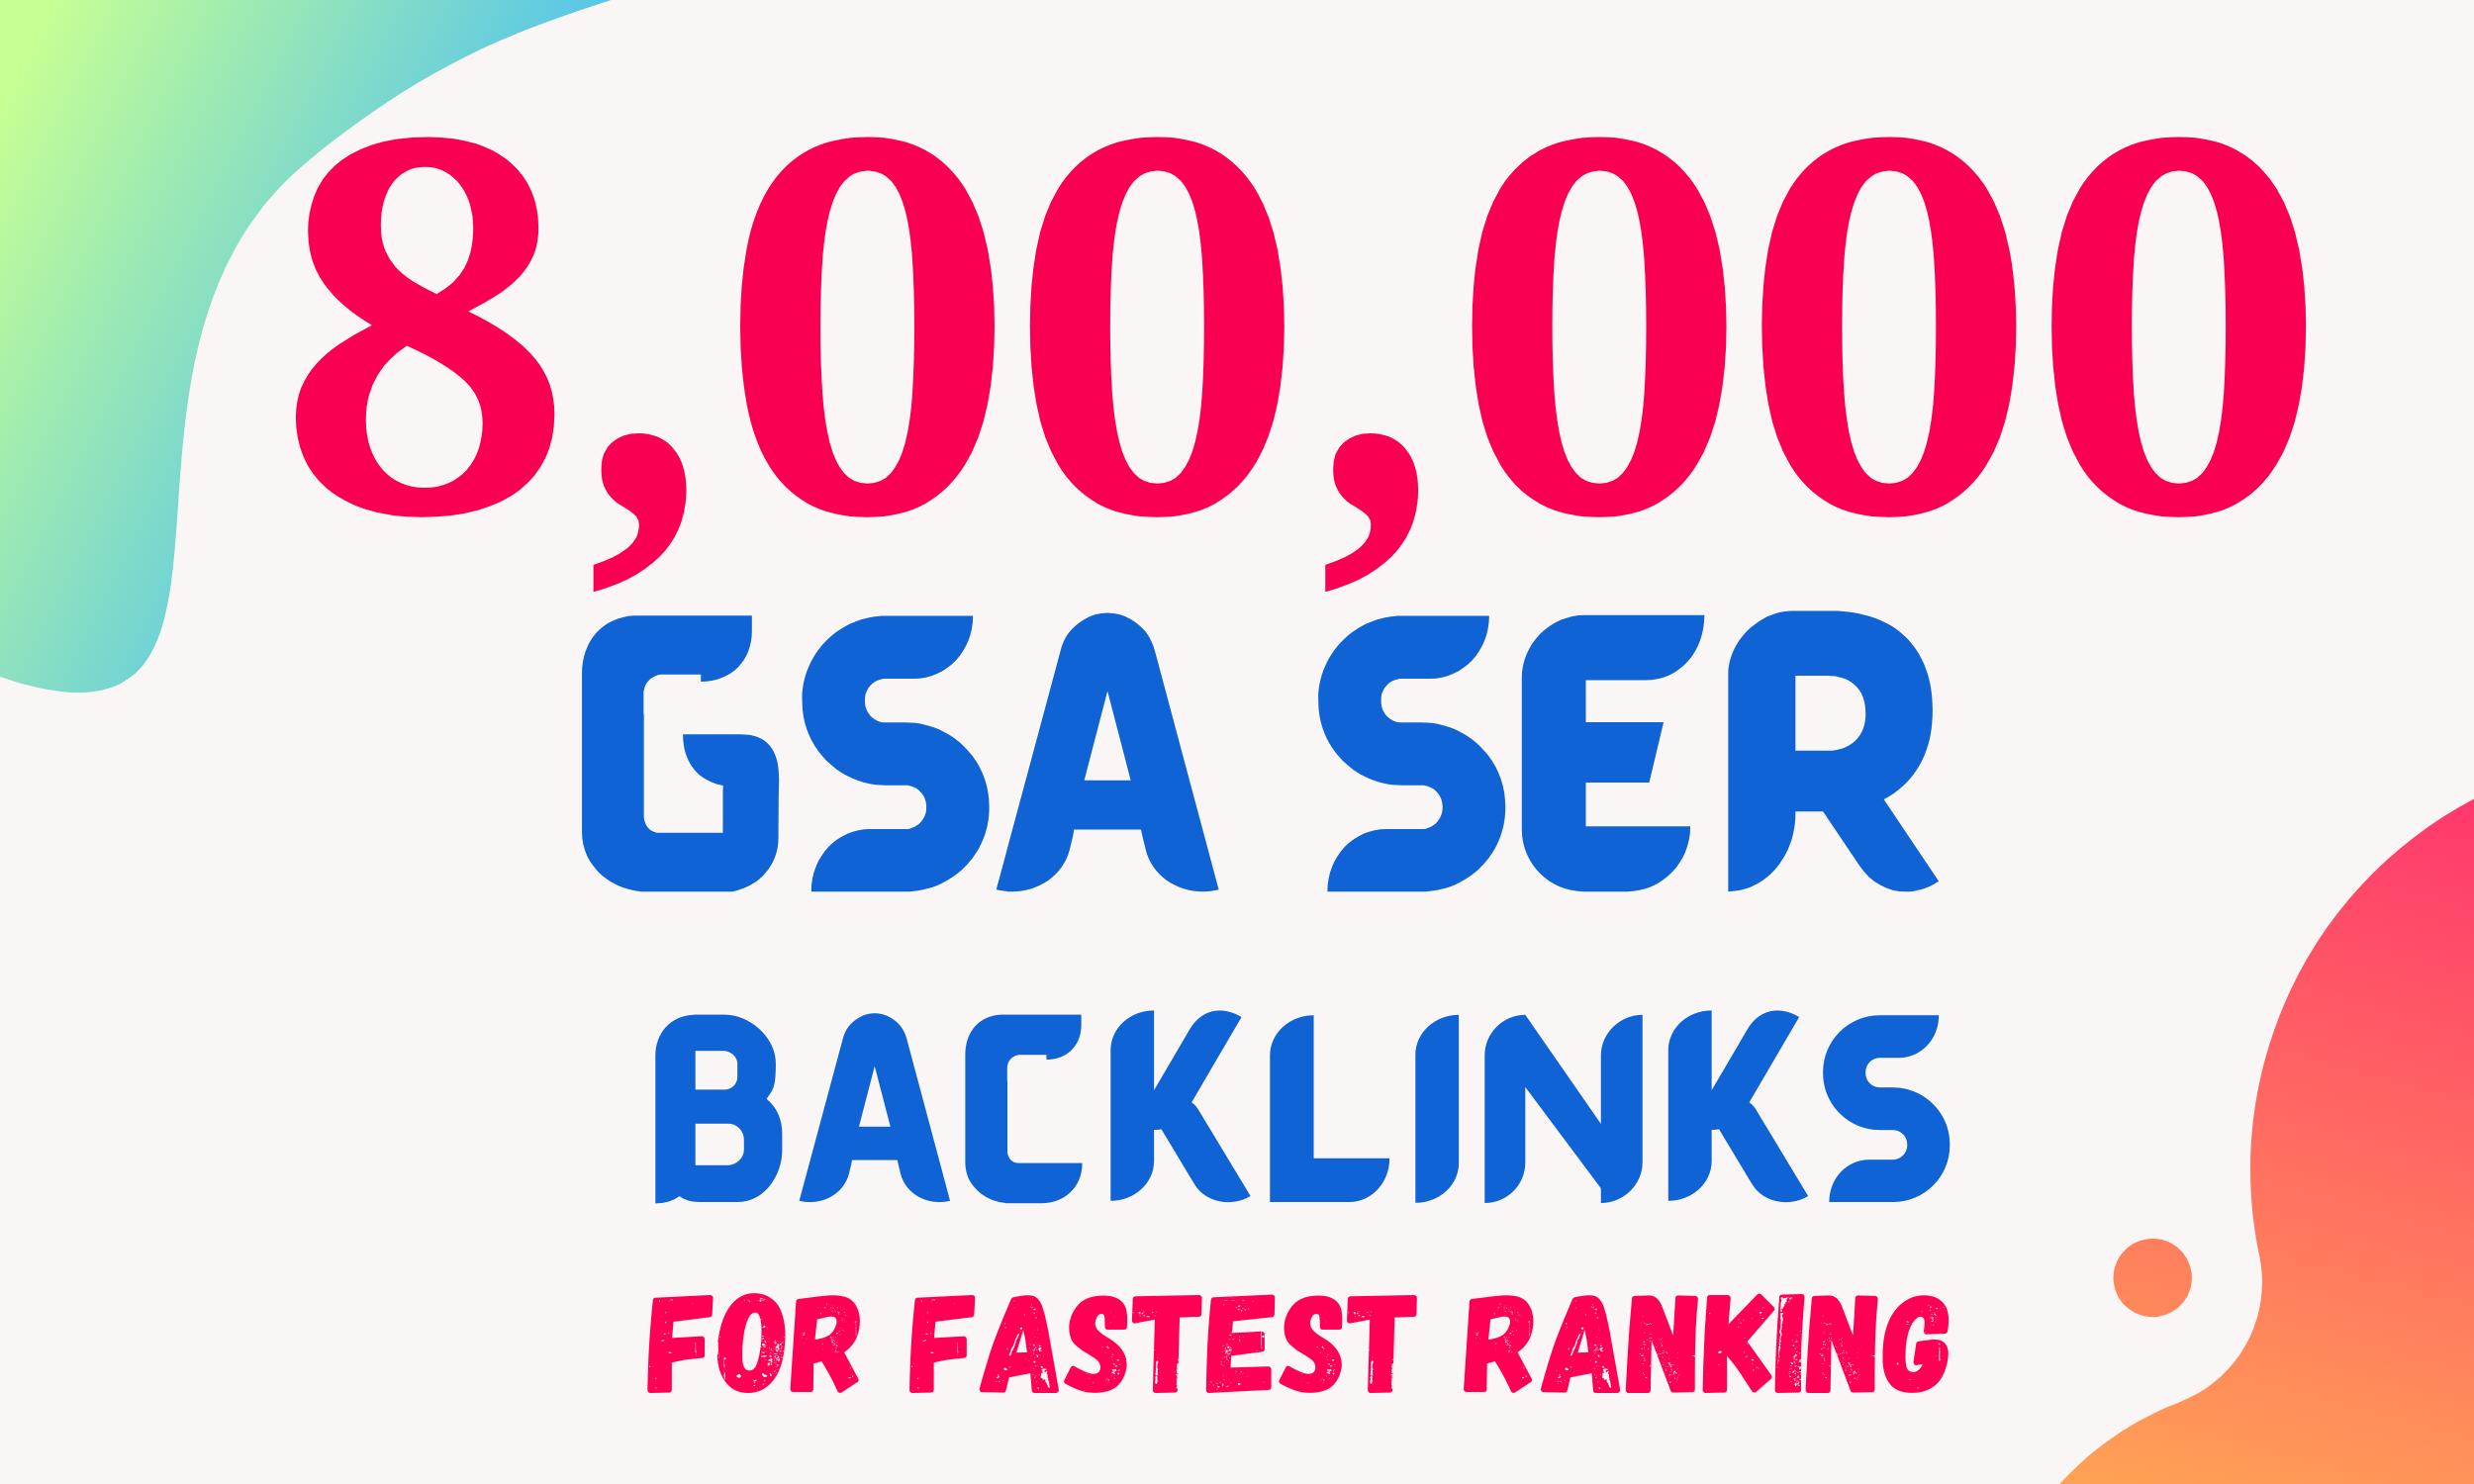 I will Create 8000k High Quality GSA SER Backlinks and Rank your website on Google